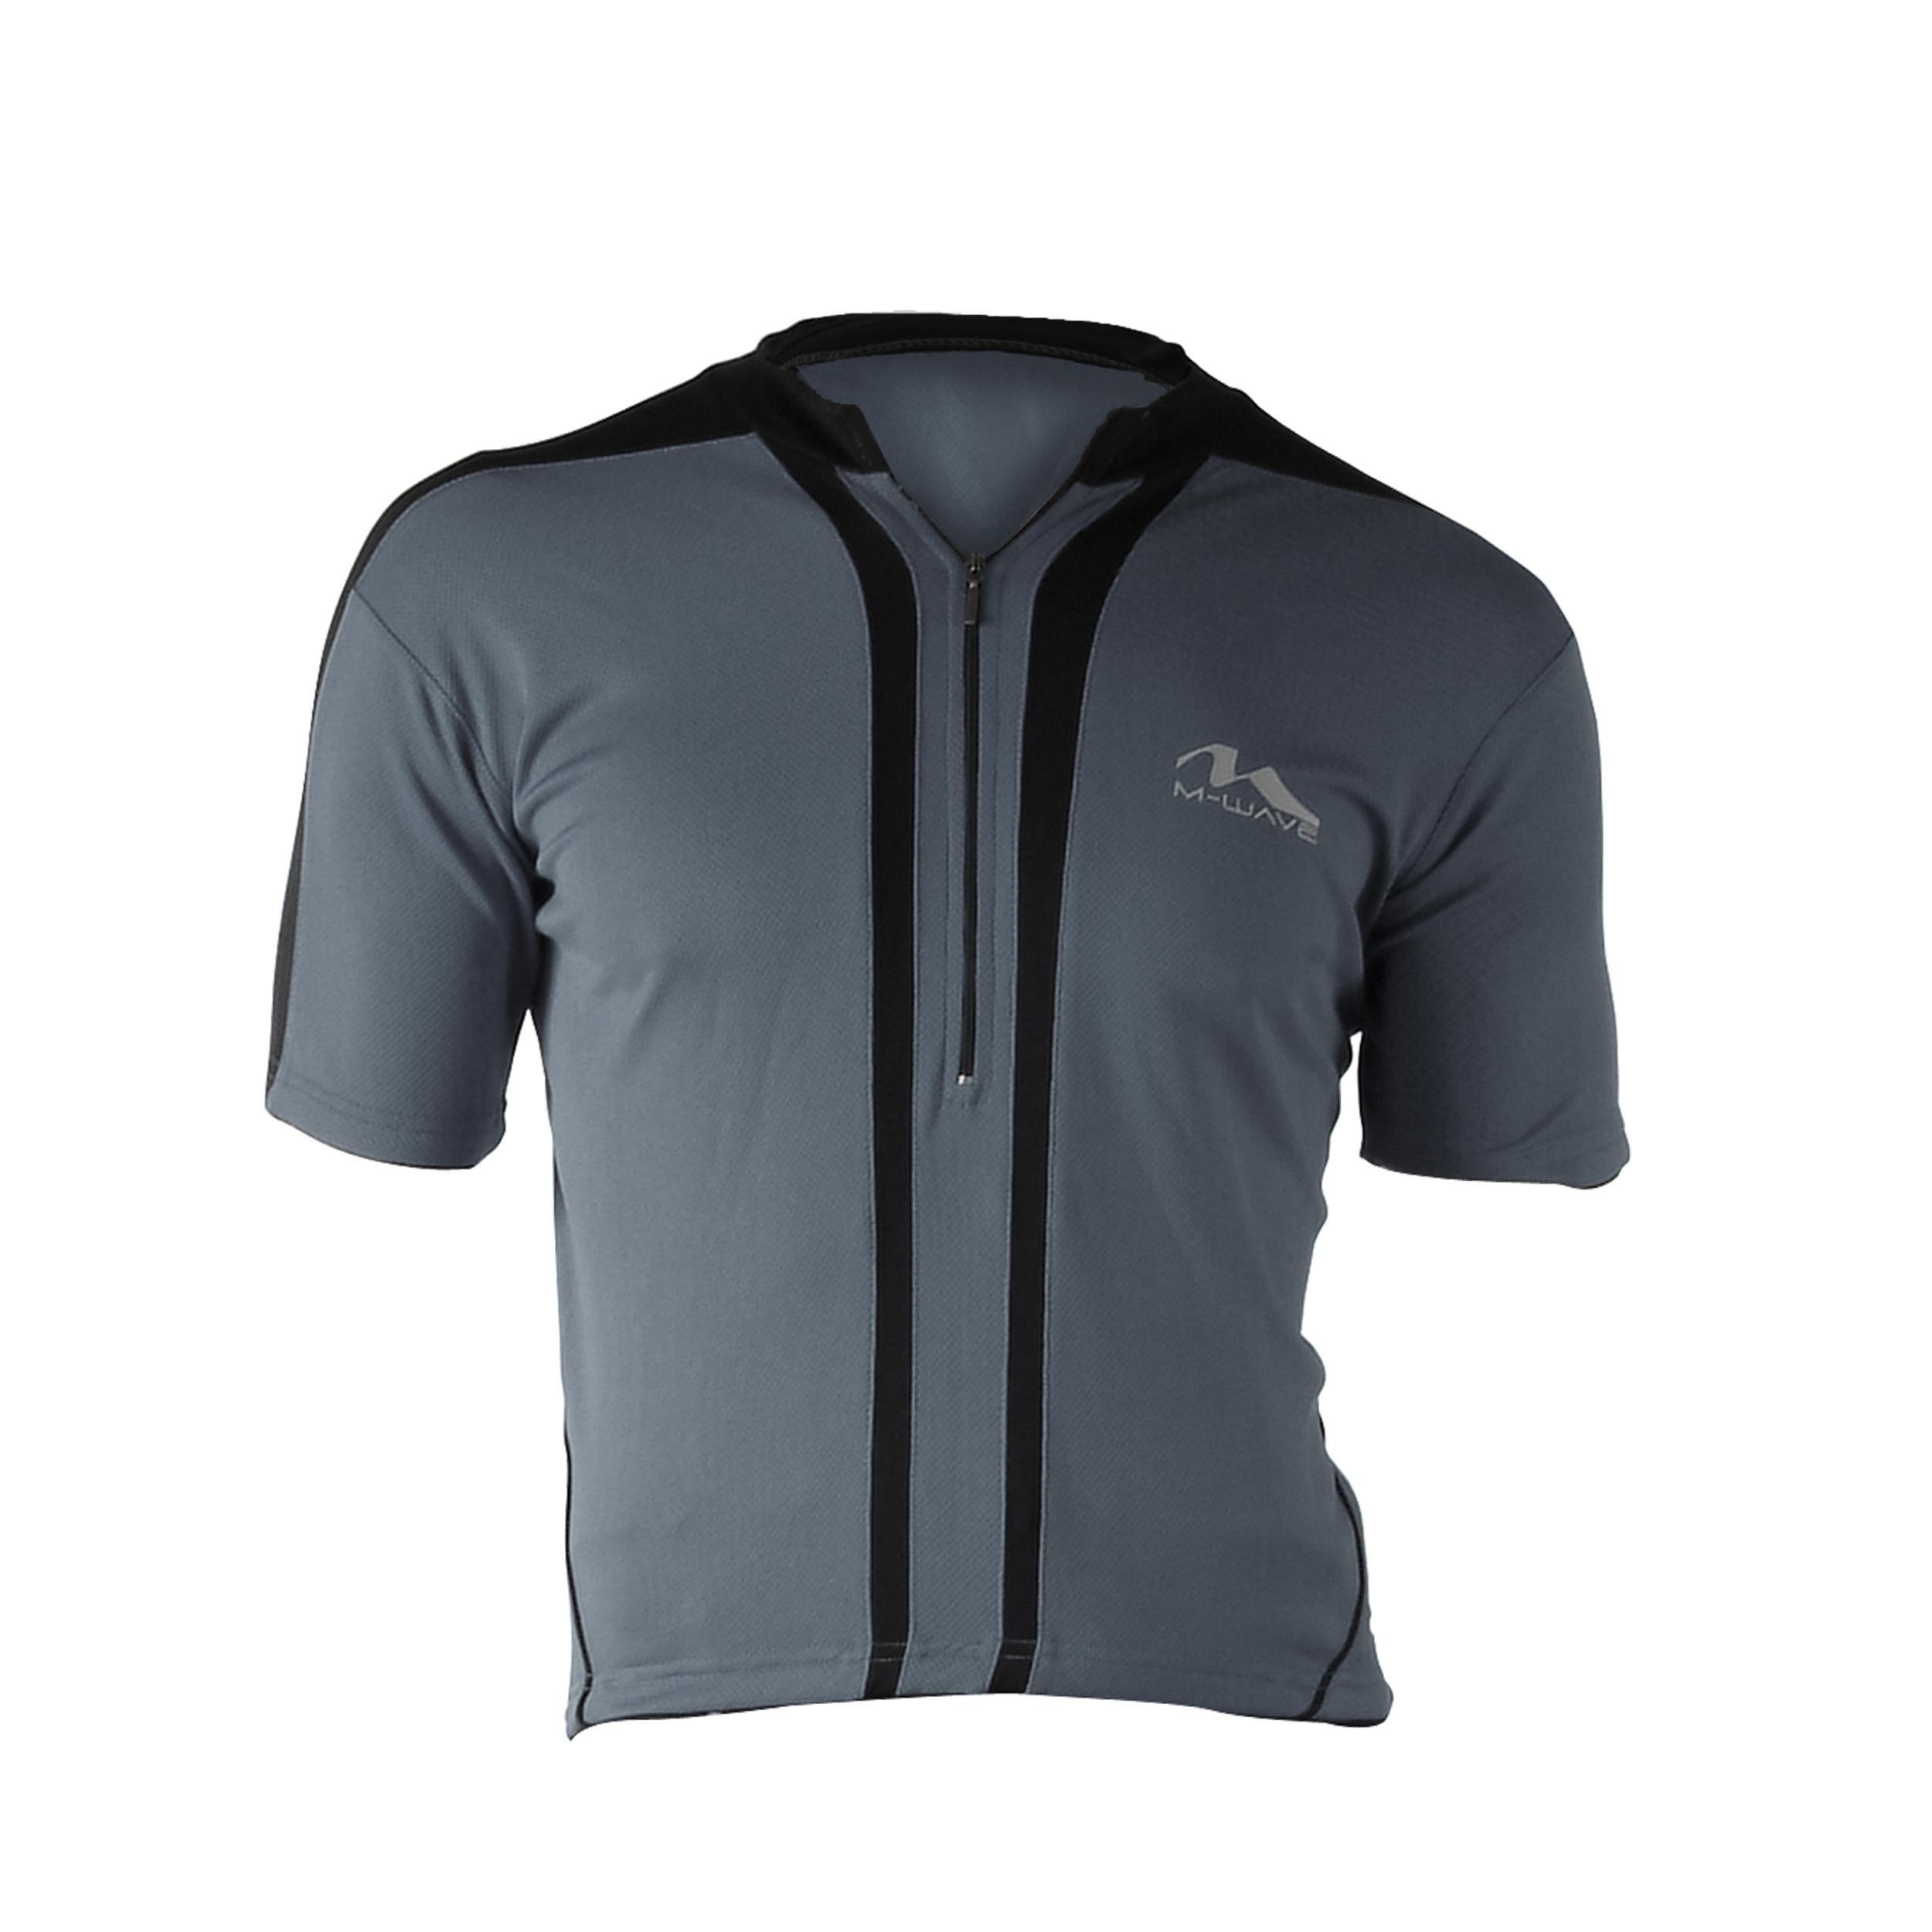 Cycle Force Men's M-Wave Dark Grey Bicycle Jersey